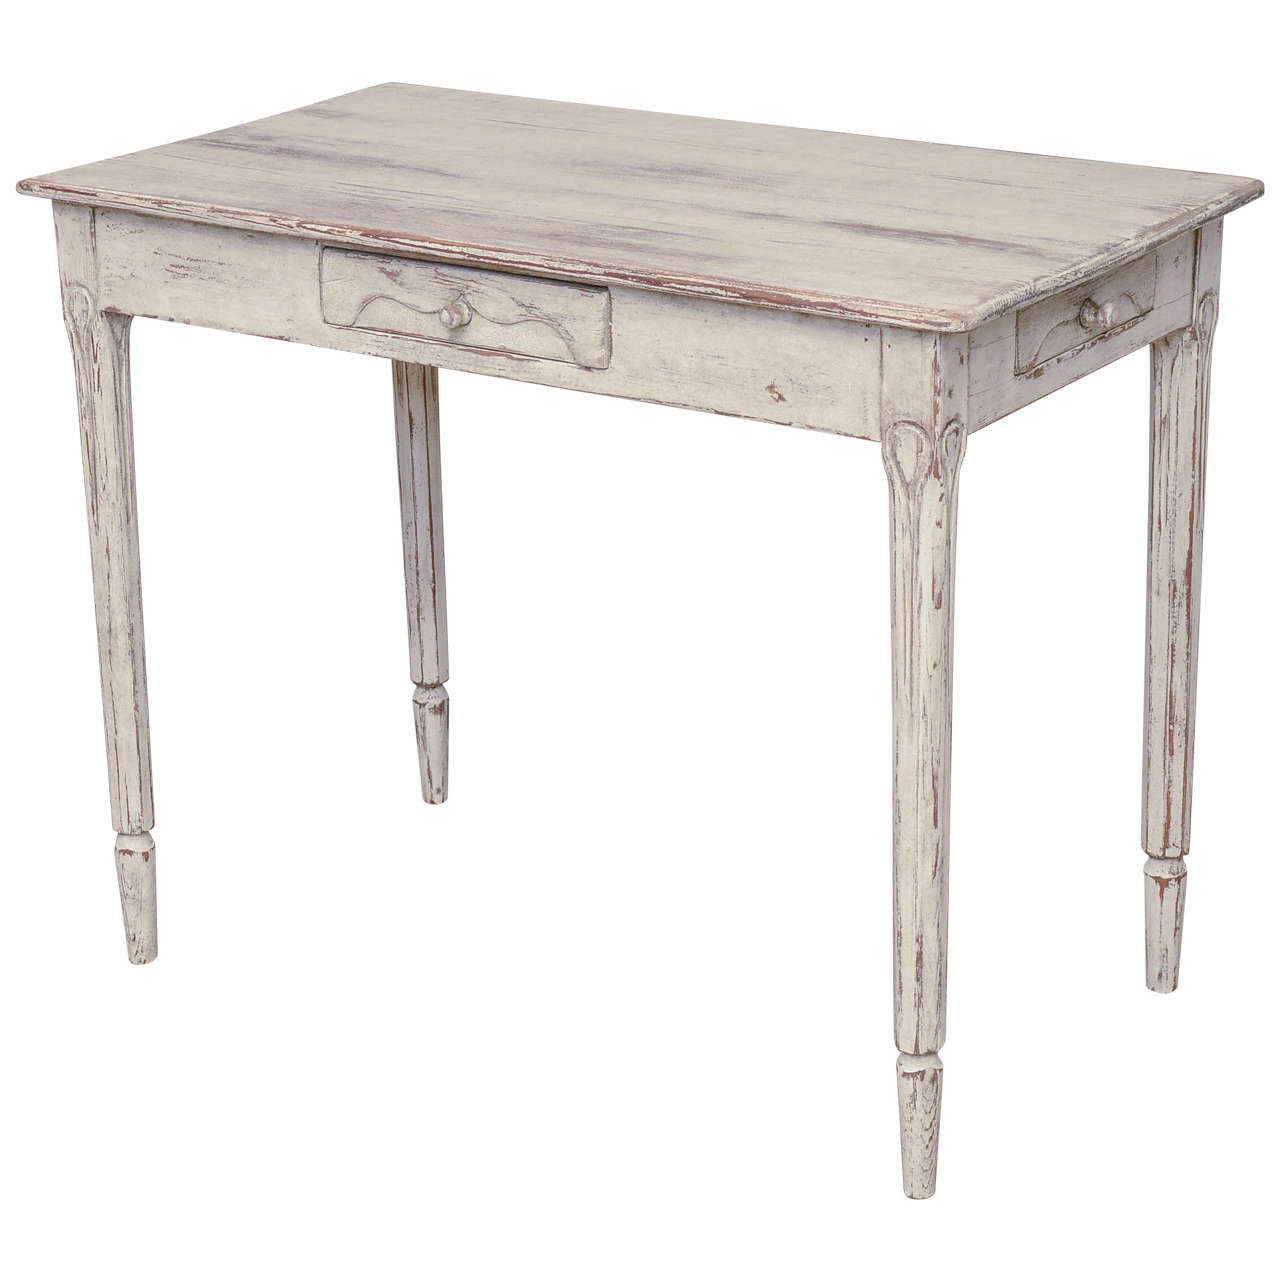 19th Century Antique Swedish Gustavian Table with Three Drawers For Sale - 19th Century Antique Swedish Gustavian Table With Three Drawers At